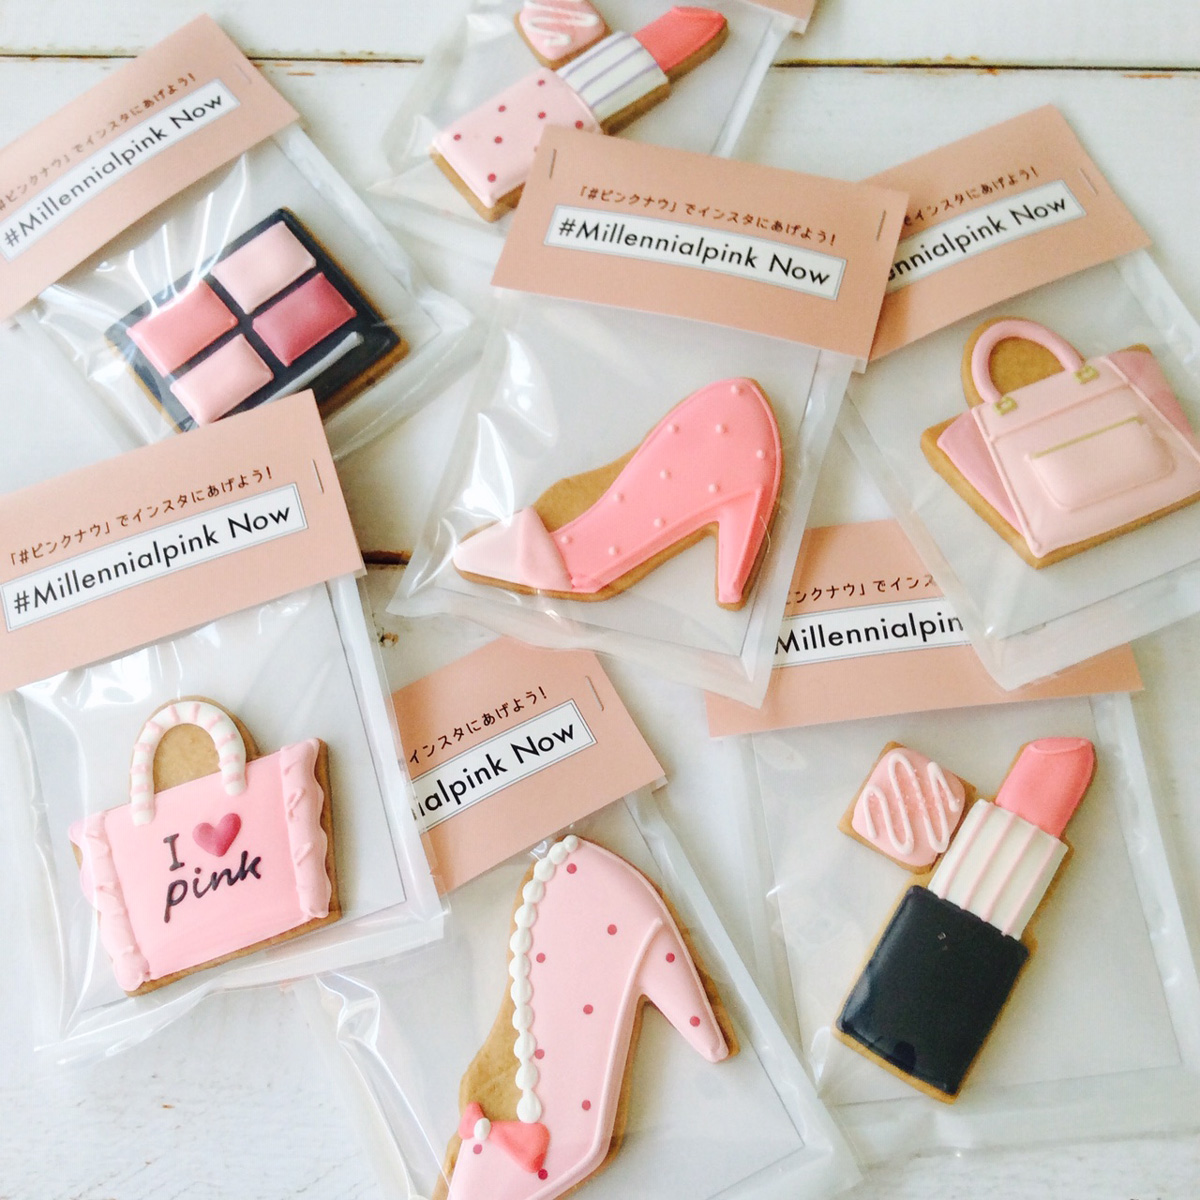 「Millennial pink Now 」キャンペーンクッキー